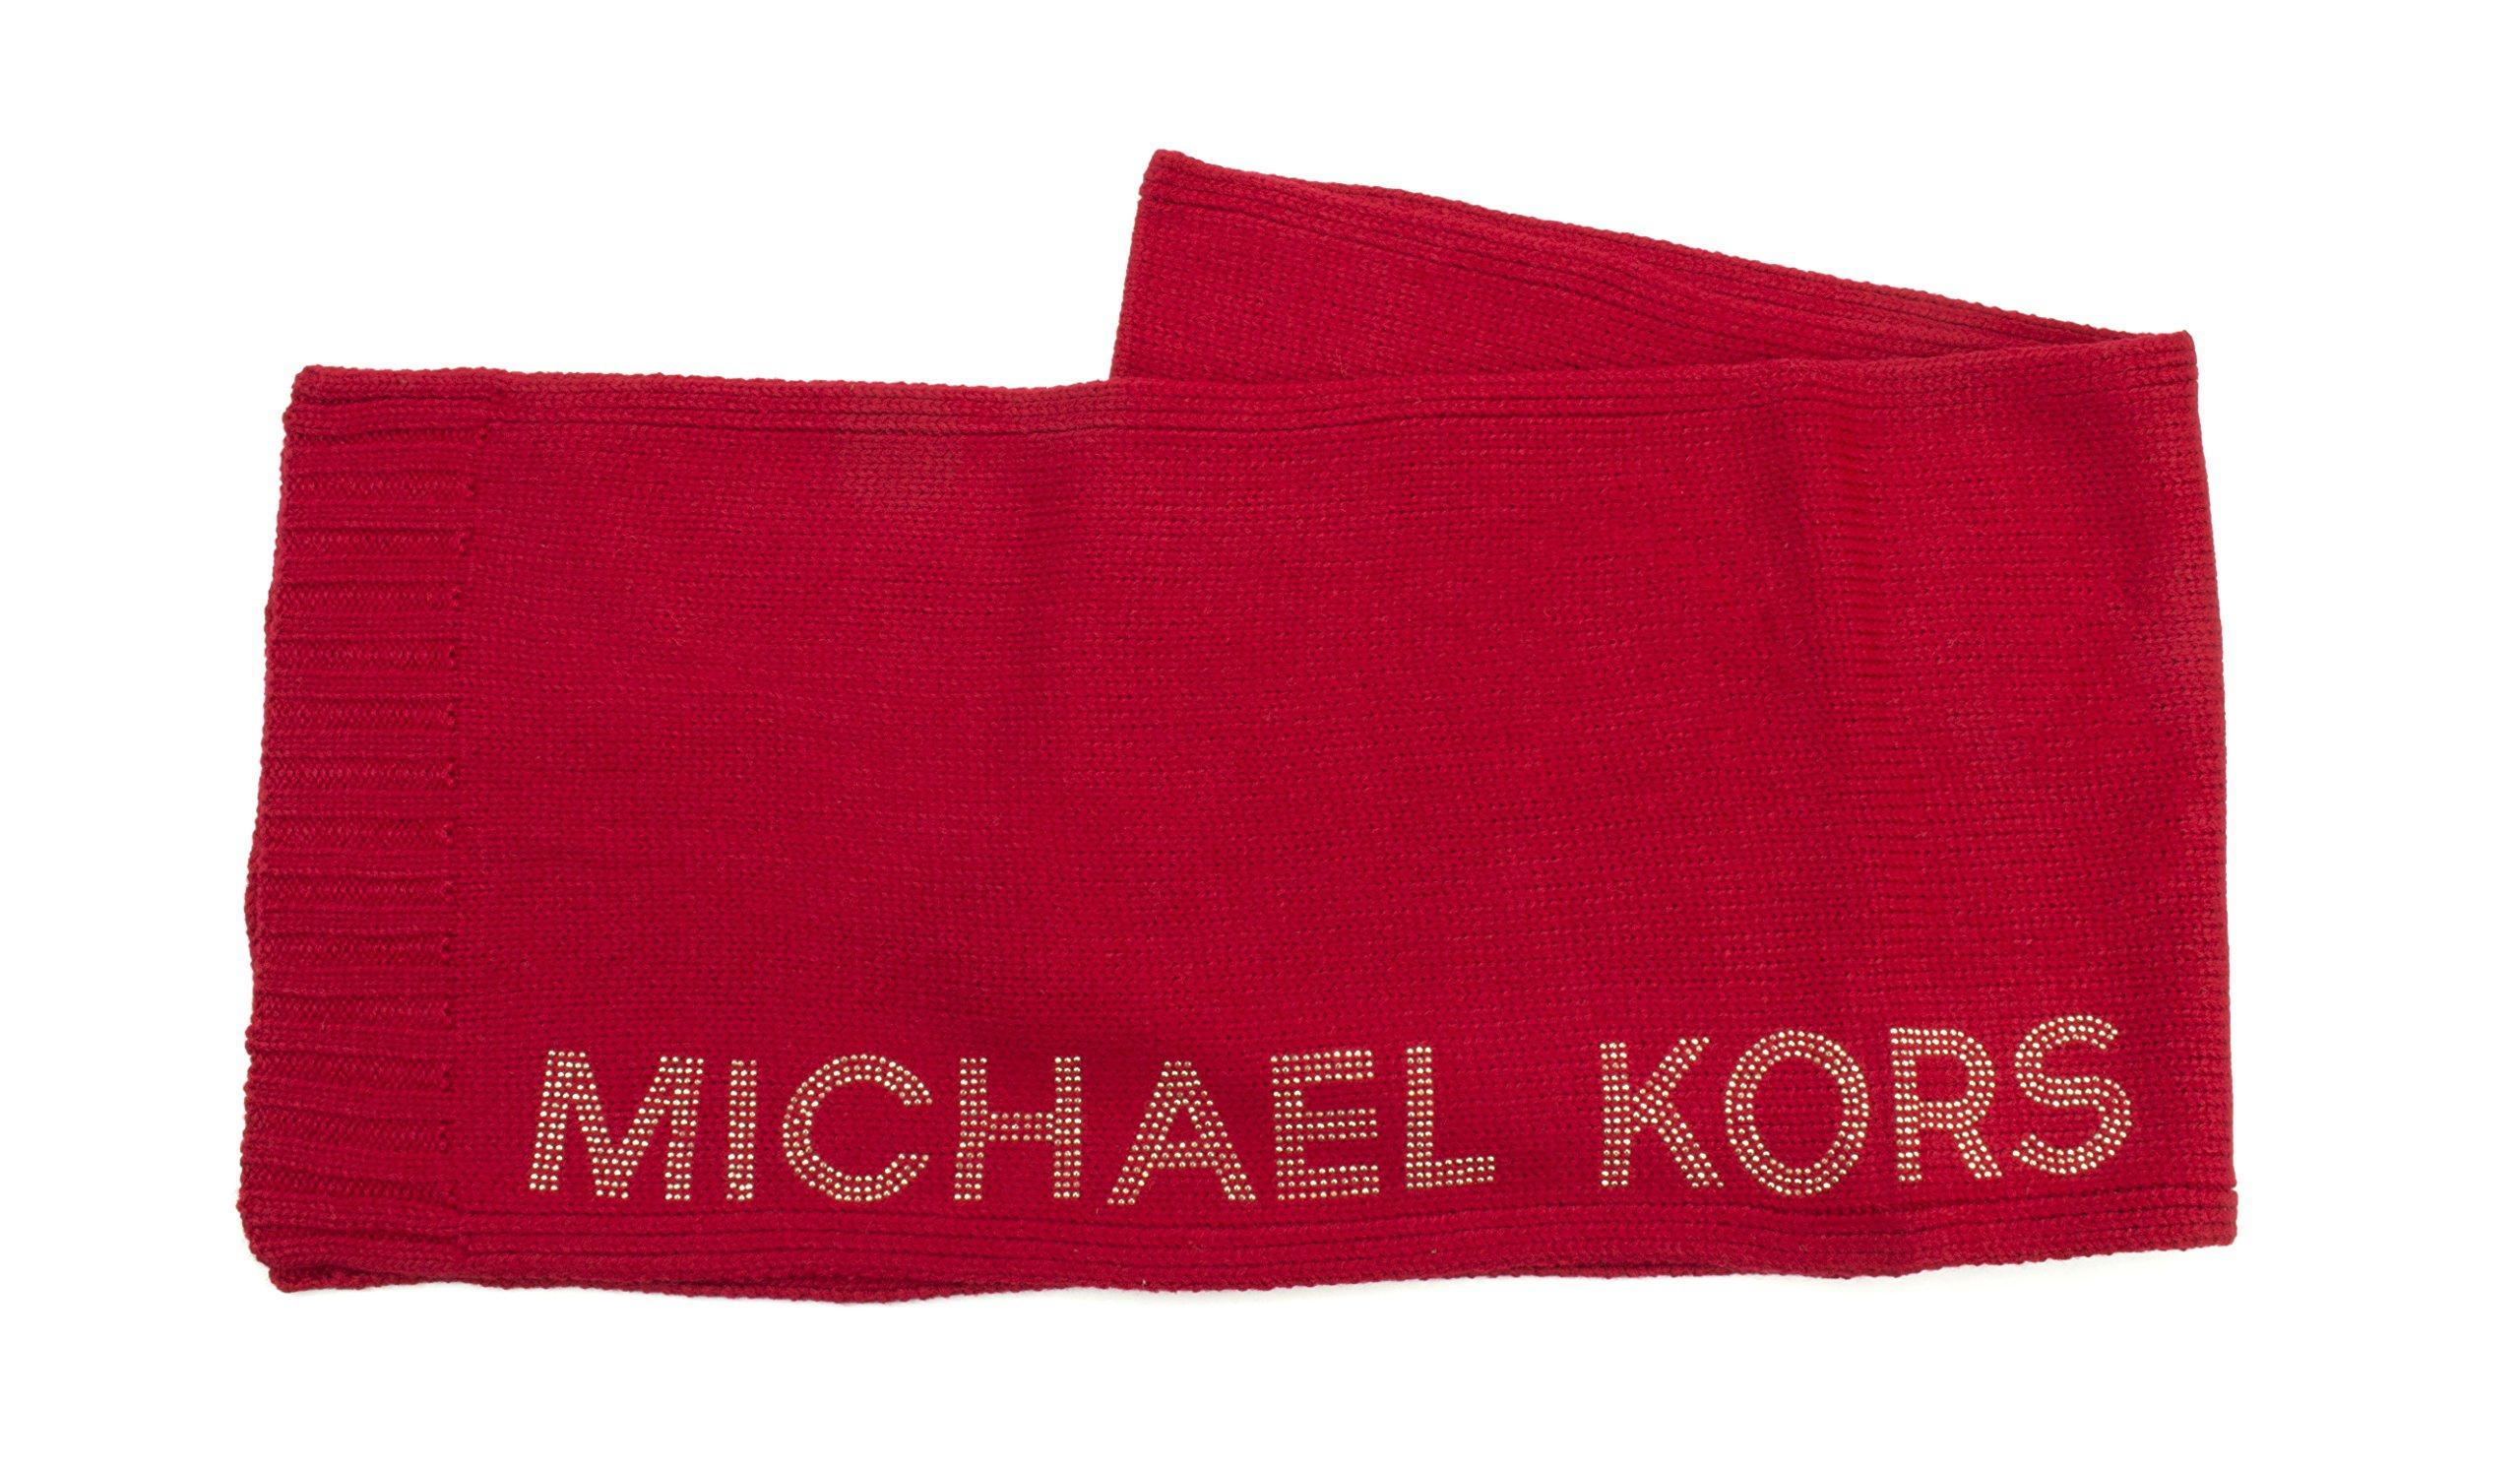 Michael Kors Heat Seal Studded Logo Scarf (Blaze red/Gold)